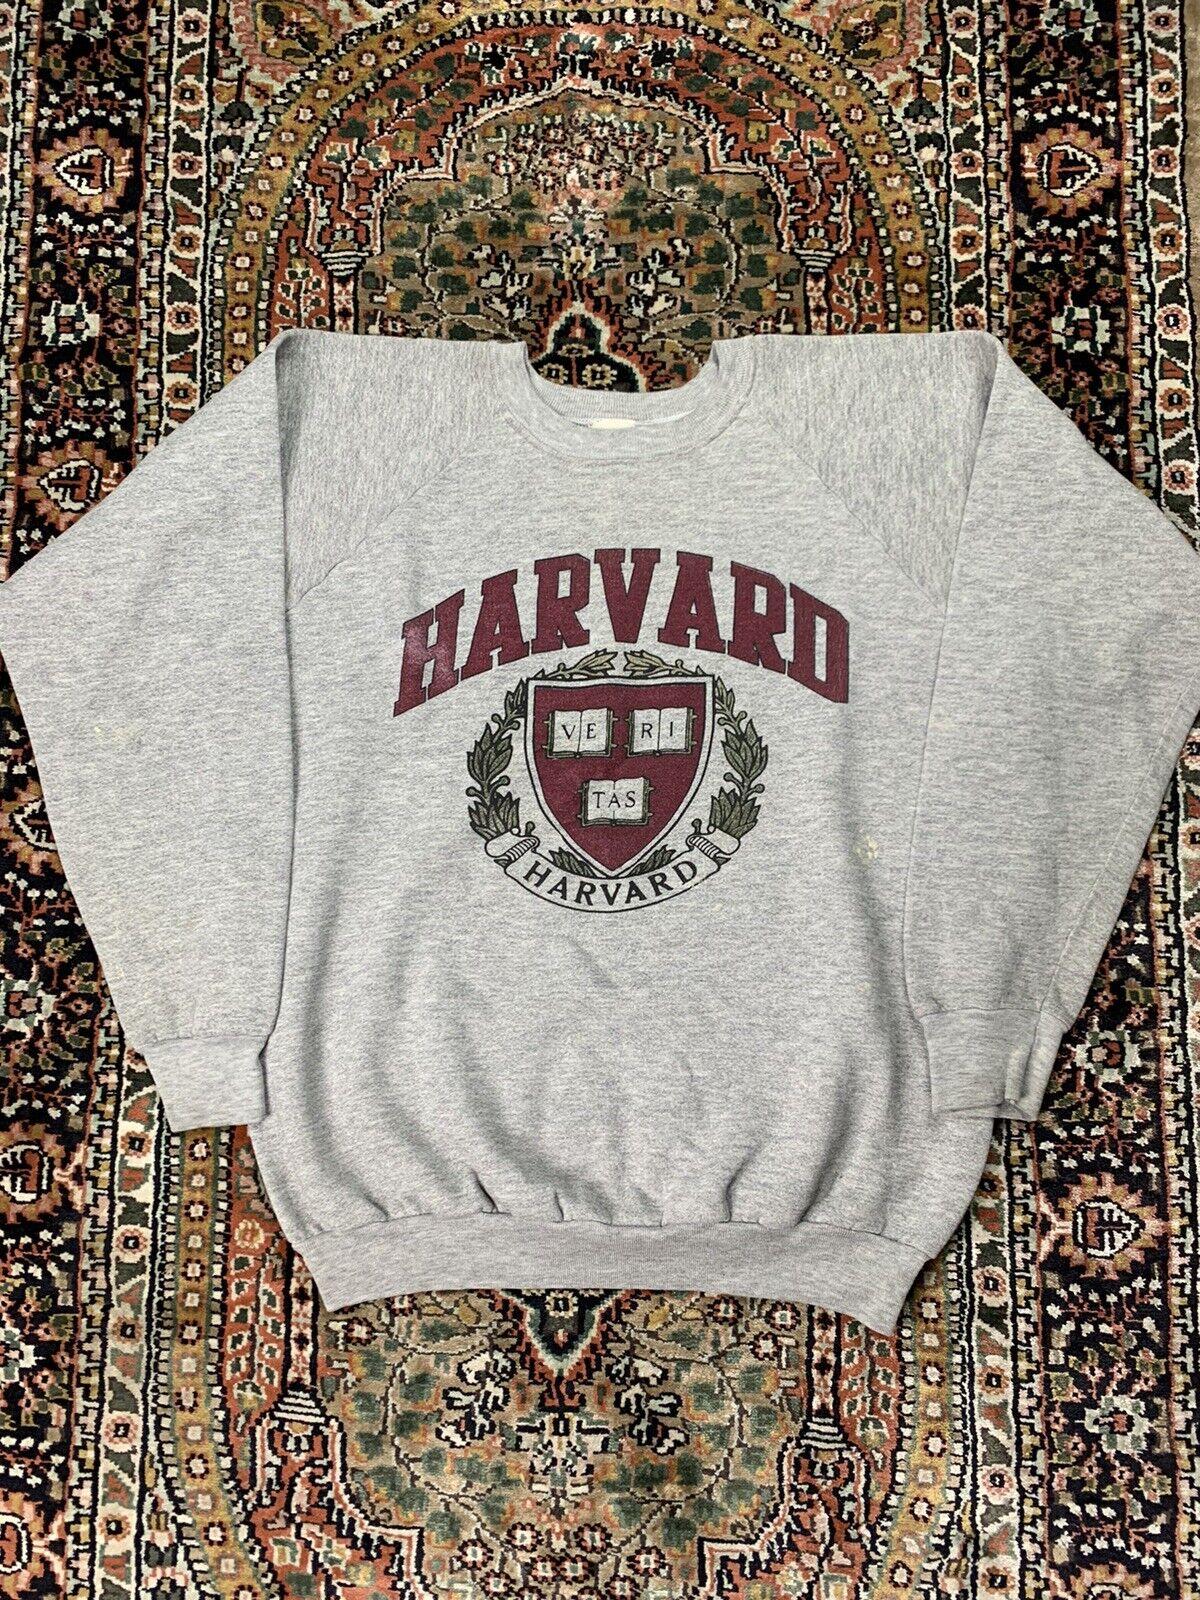 Vtg Harvard Crewneck Sweatshirt Size XL 4